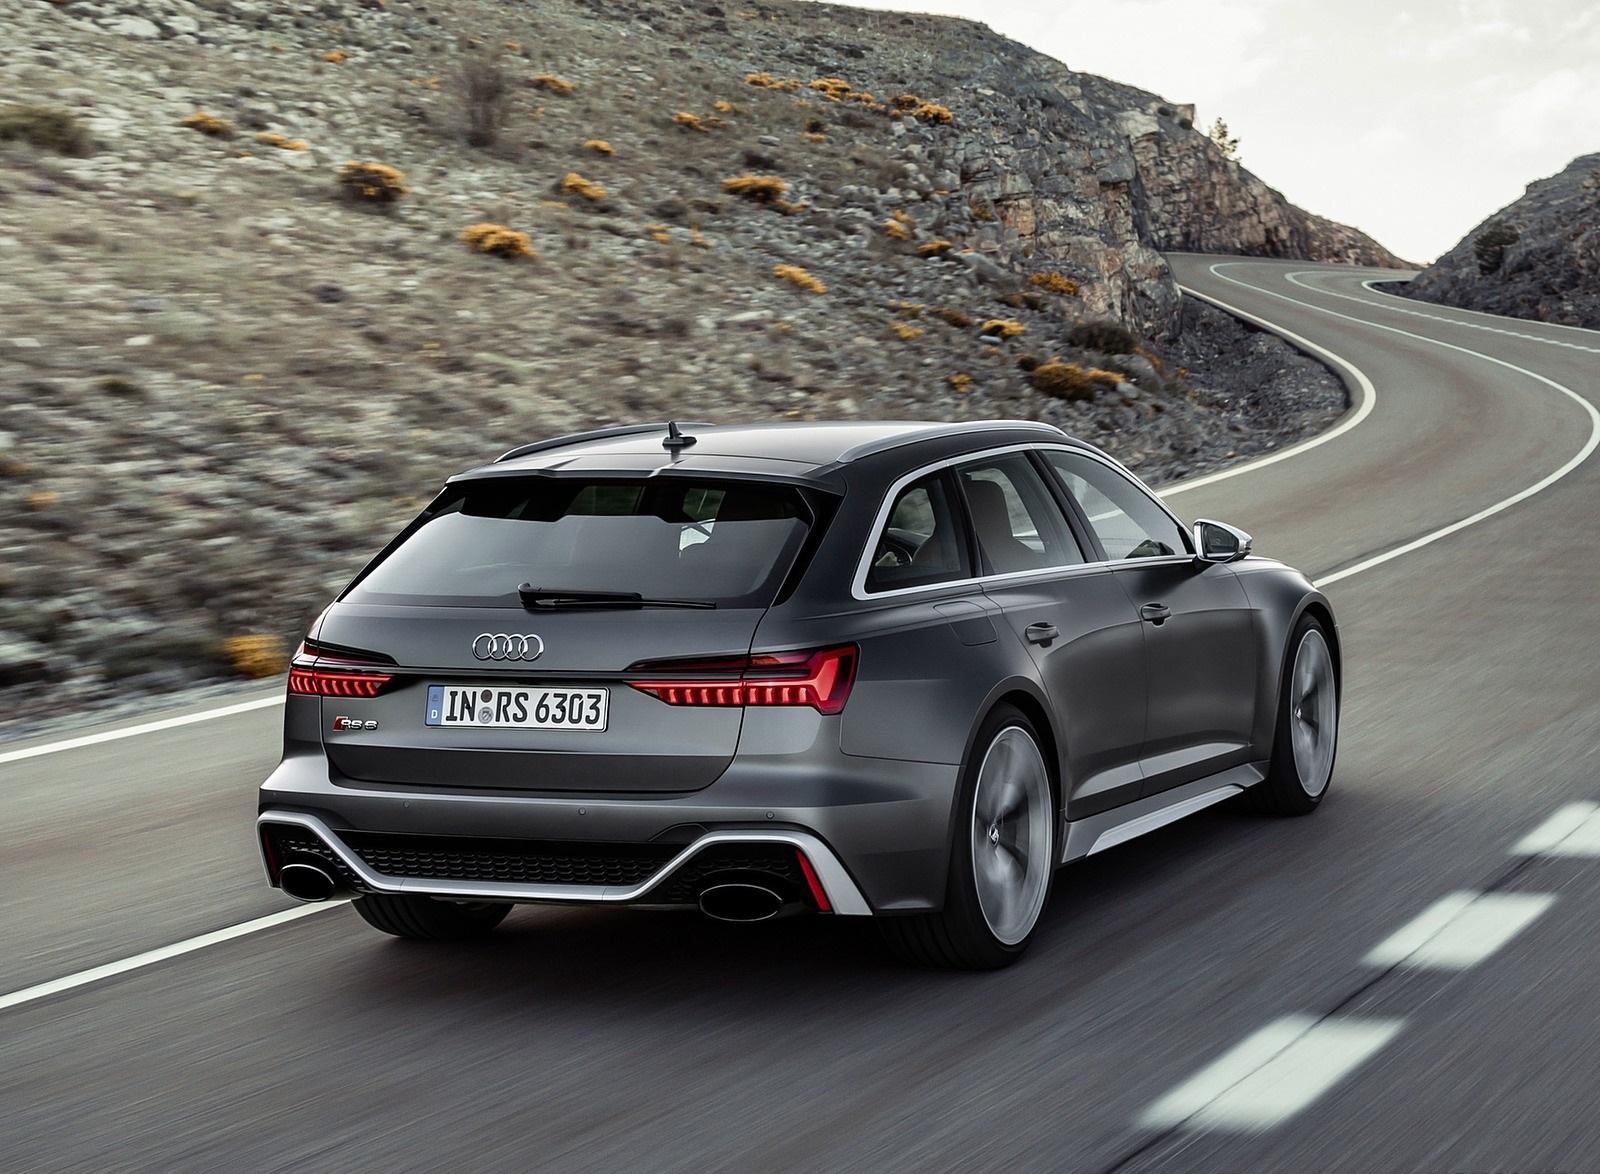 2020 Audi RS 6 Avant Rear Three-Quarter Wallpapers (2)